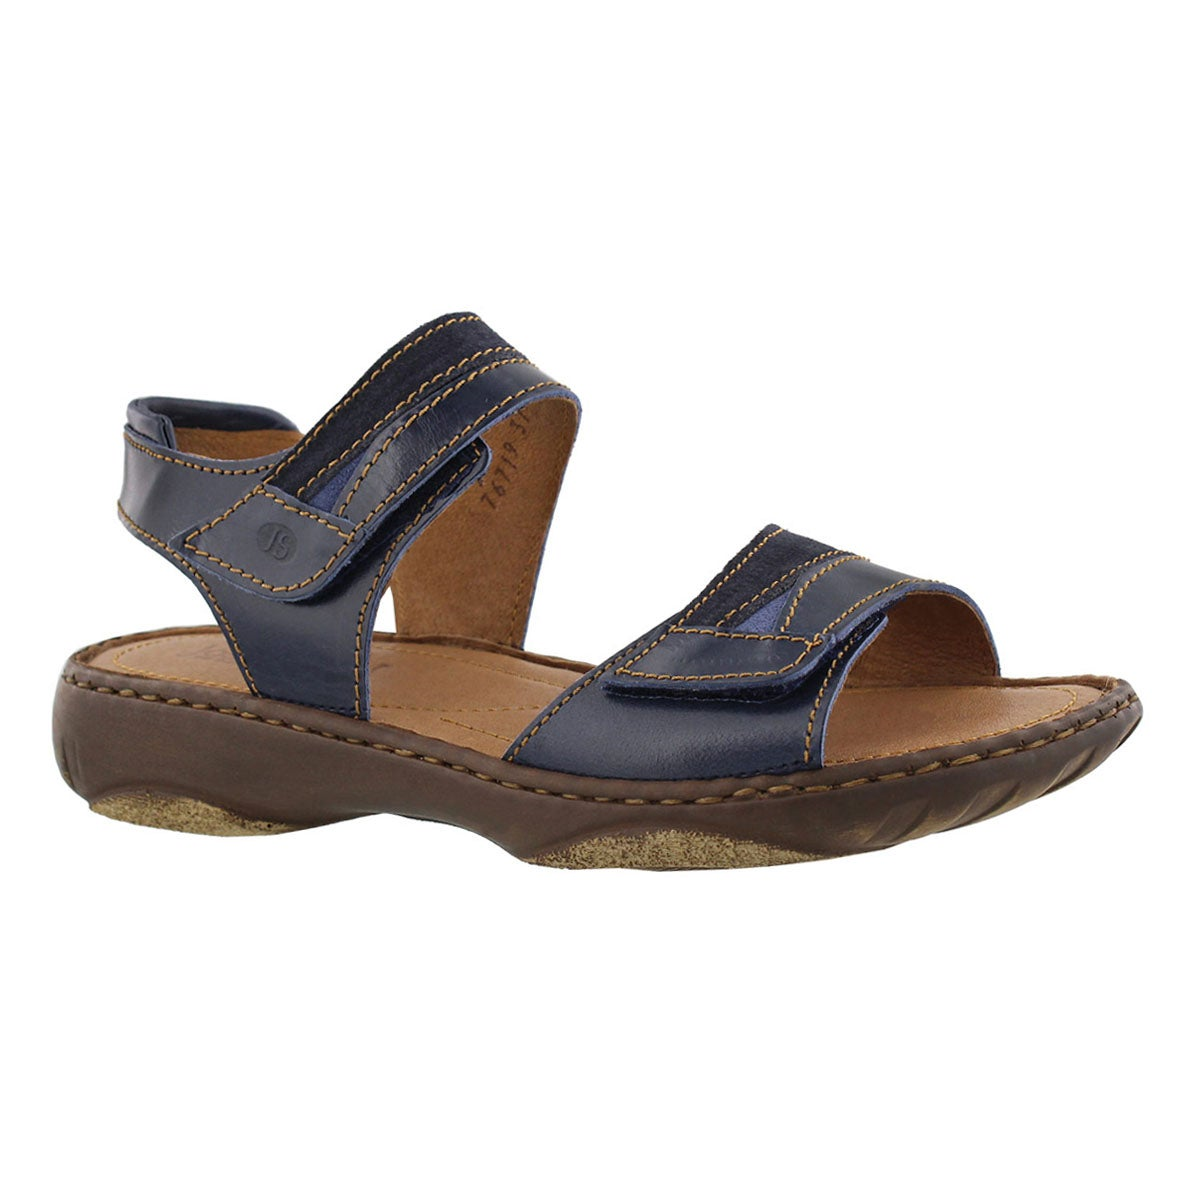 Women's DEBRA 19 denim casual 2 strap sandals